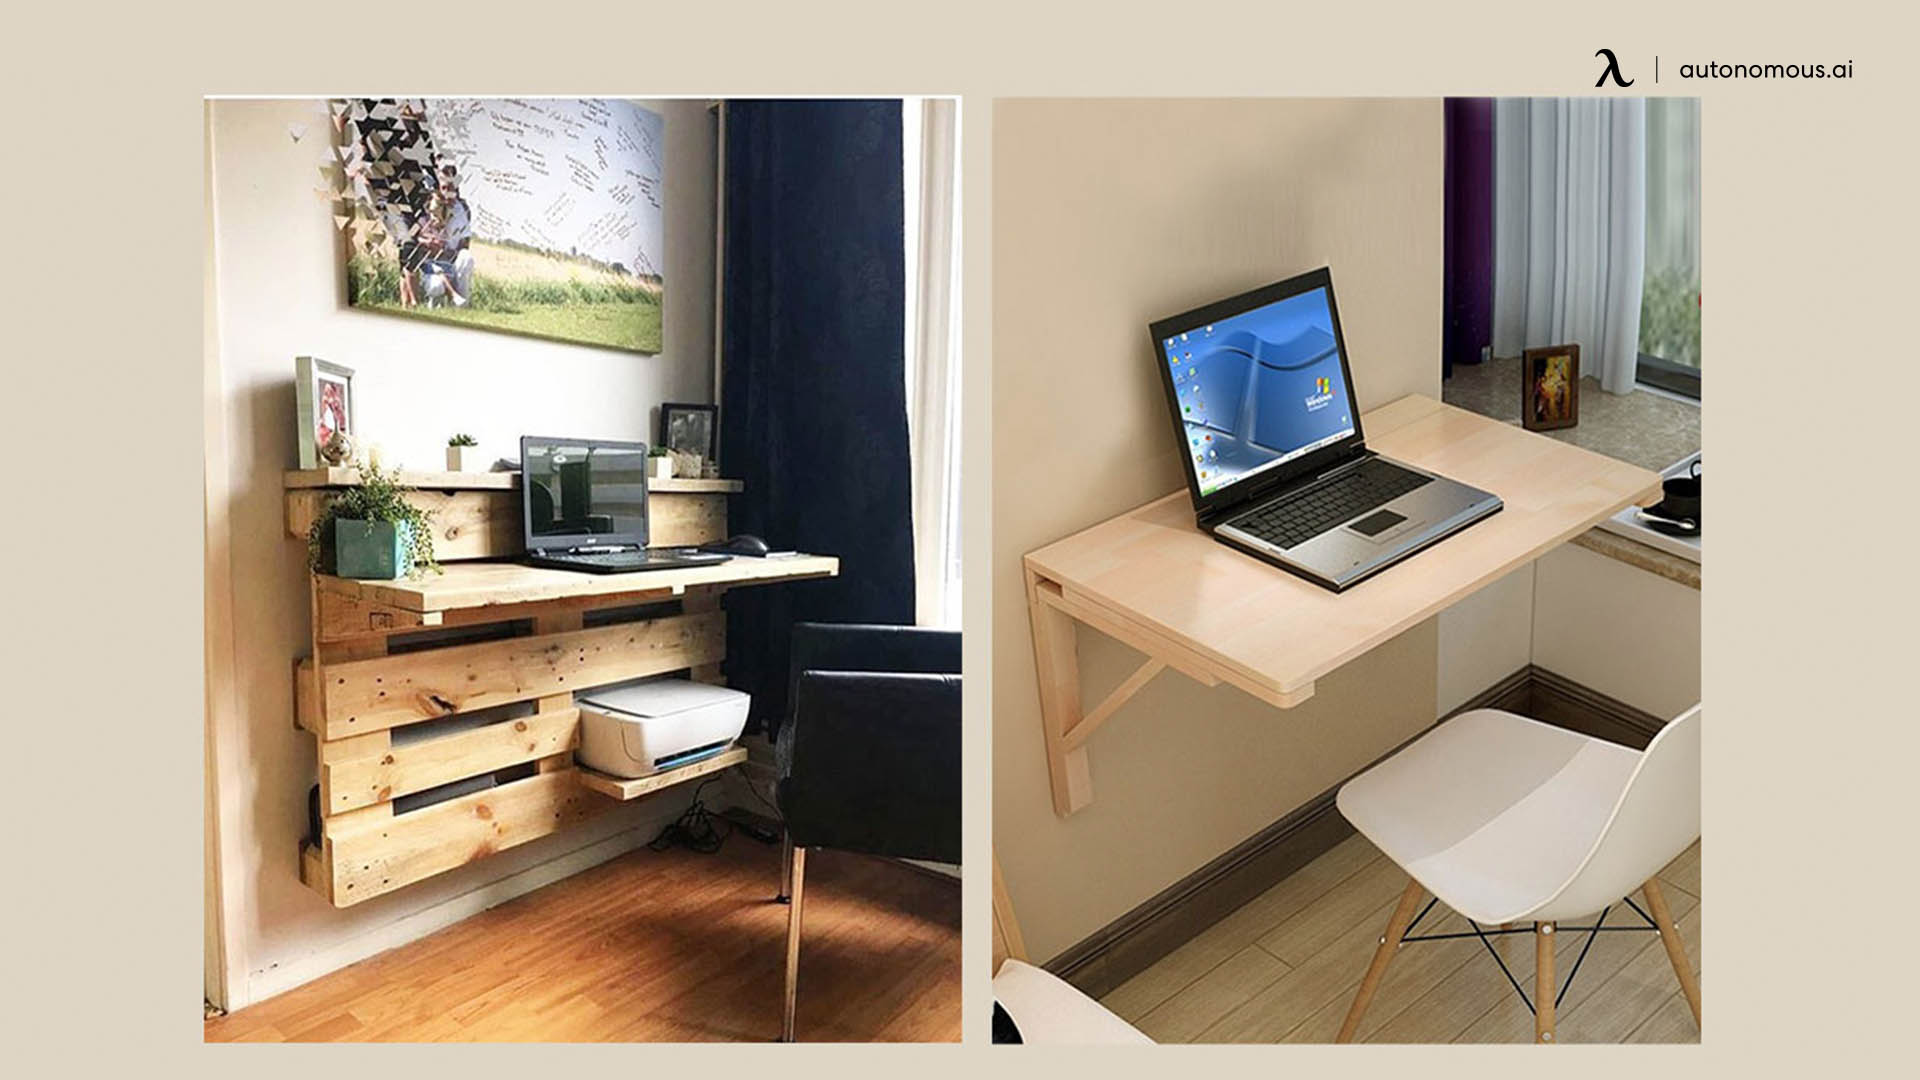 Wooden pallet standing desk idea